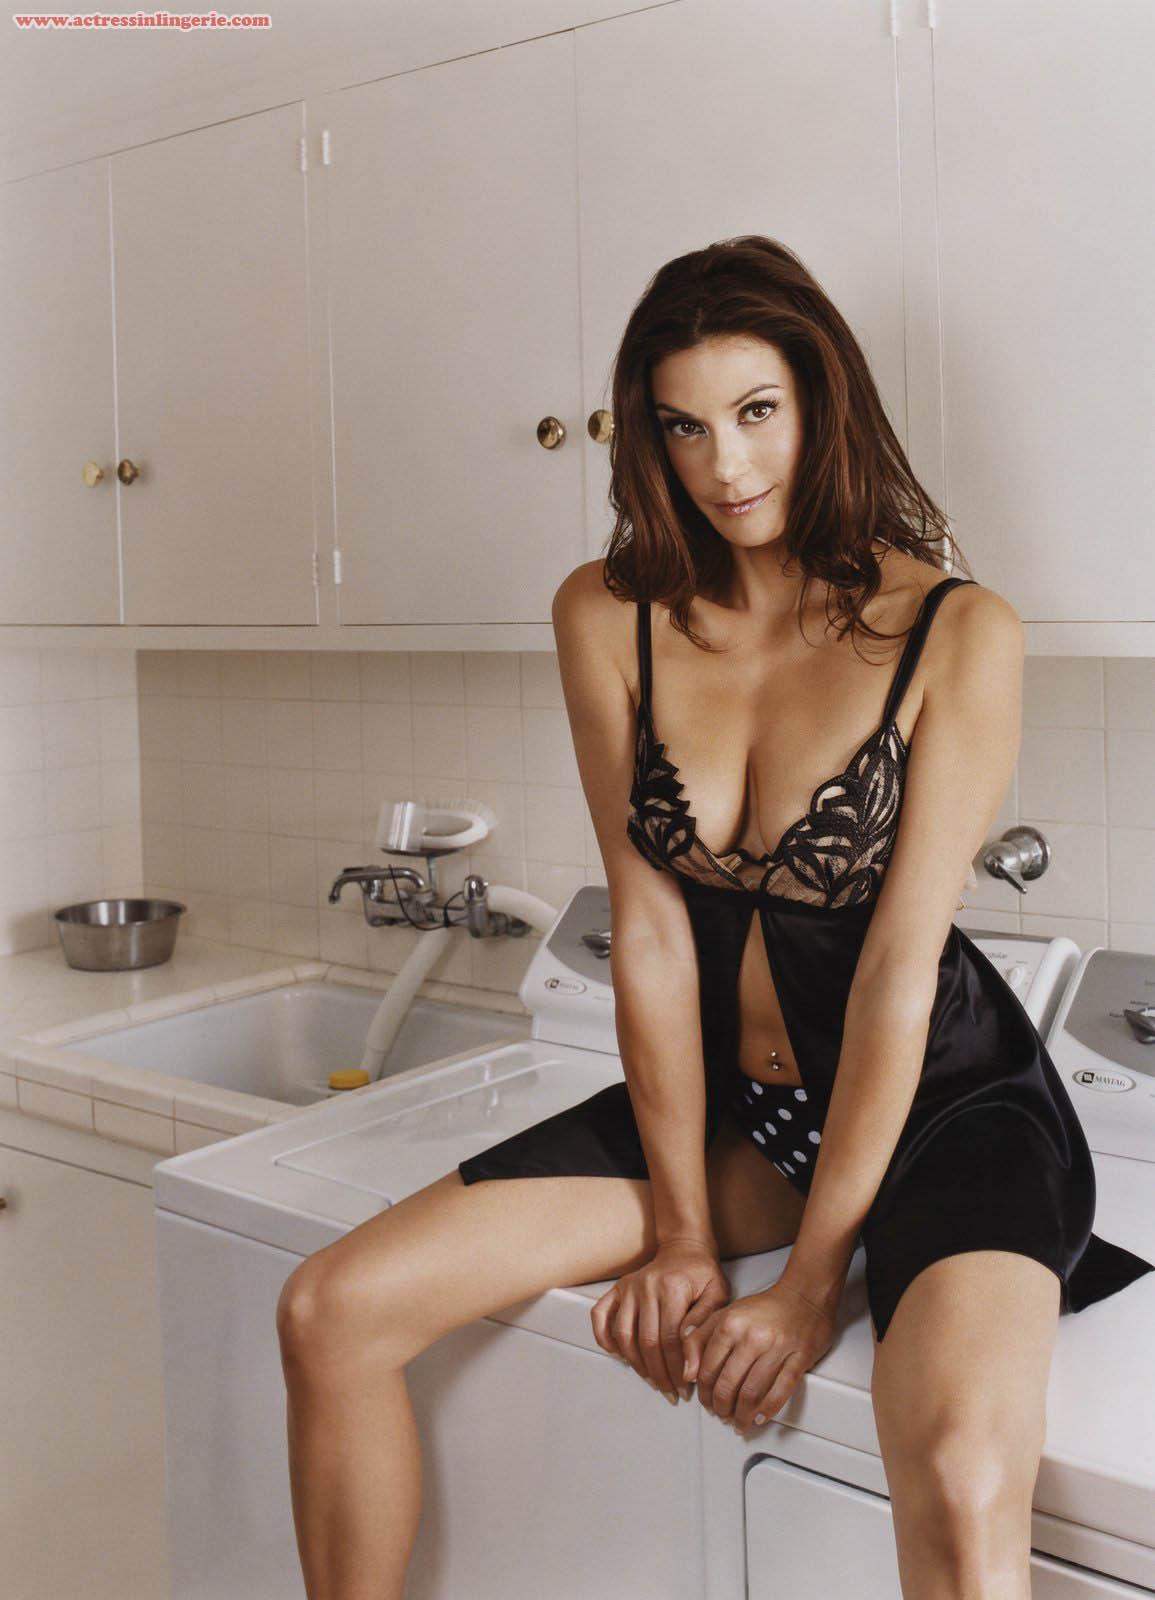 http://4.bp.blogspot.com/_JFX5_9i0Xng/S7TMktffMKI/AAAAAAAADic/zrtemHRH6bM/s1600/Teri-Hatcher-Underwear+2.jpg